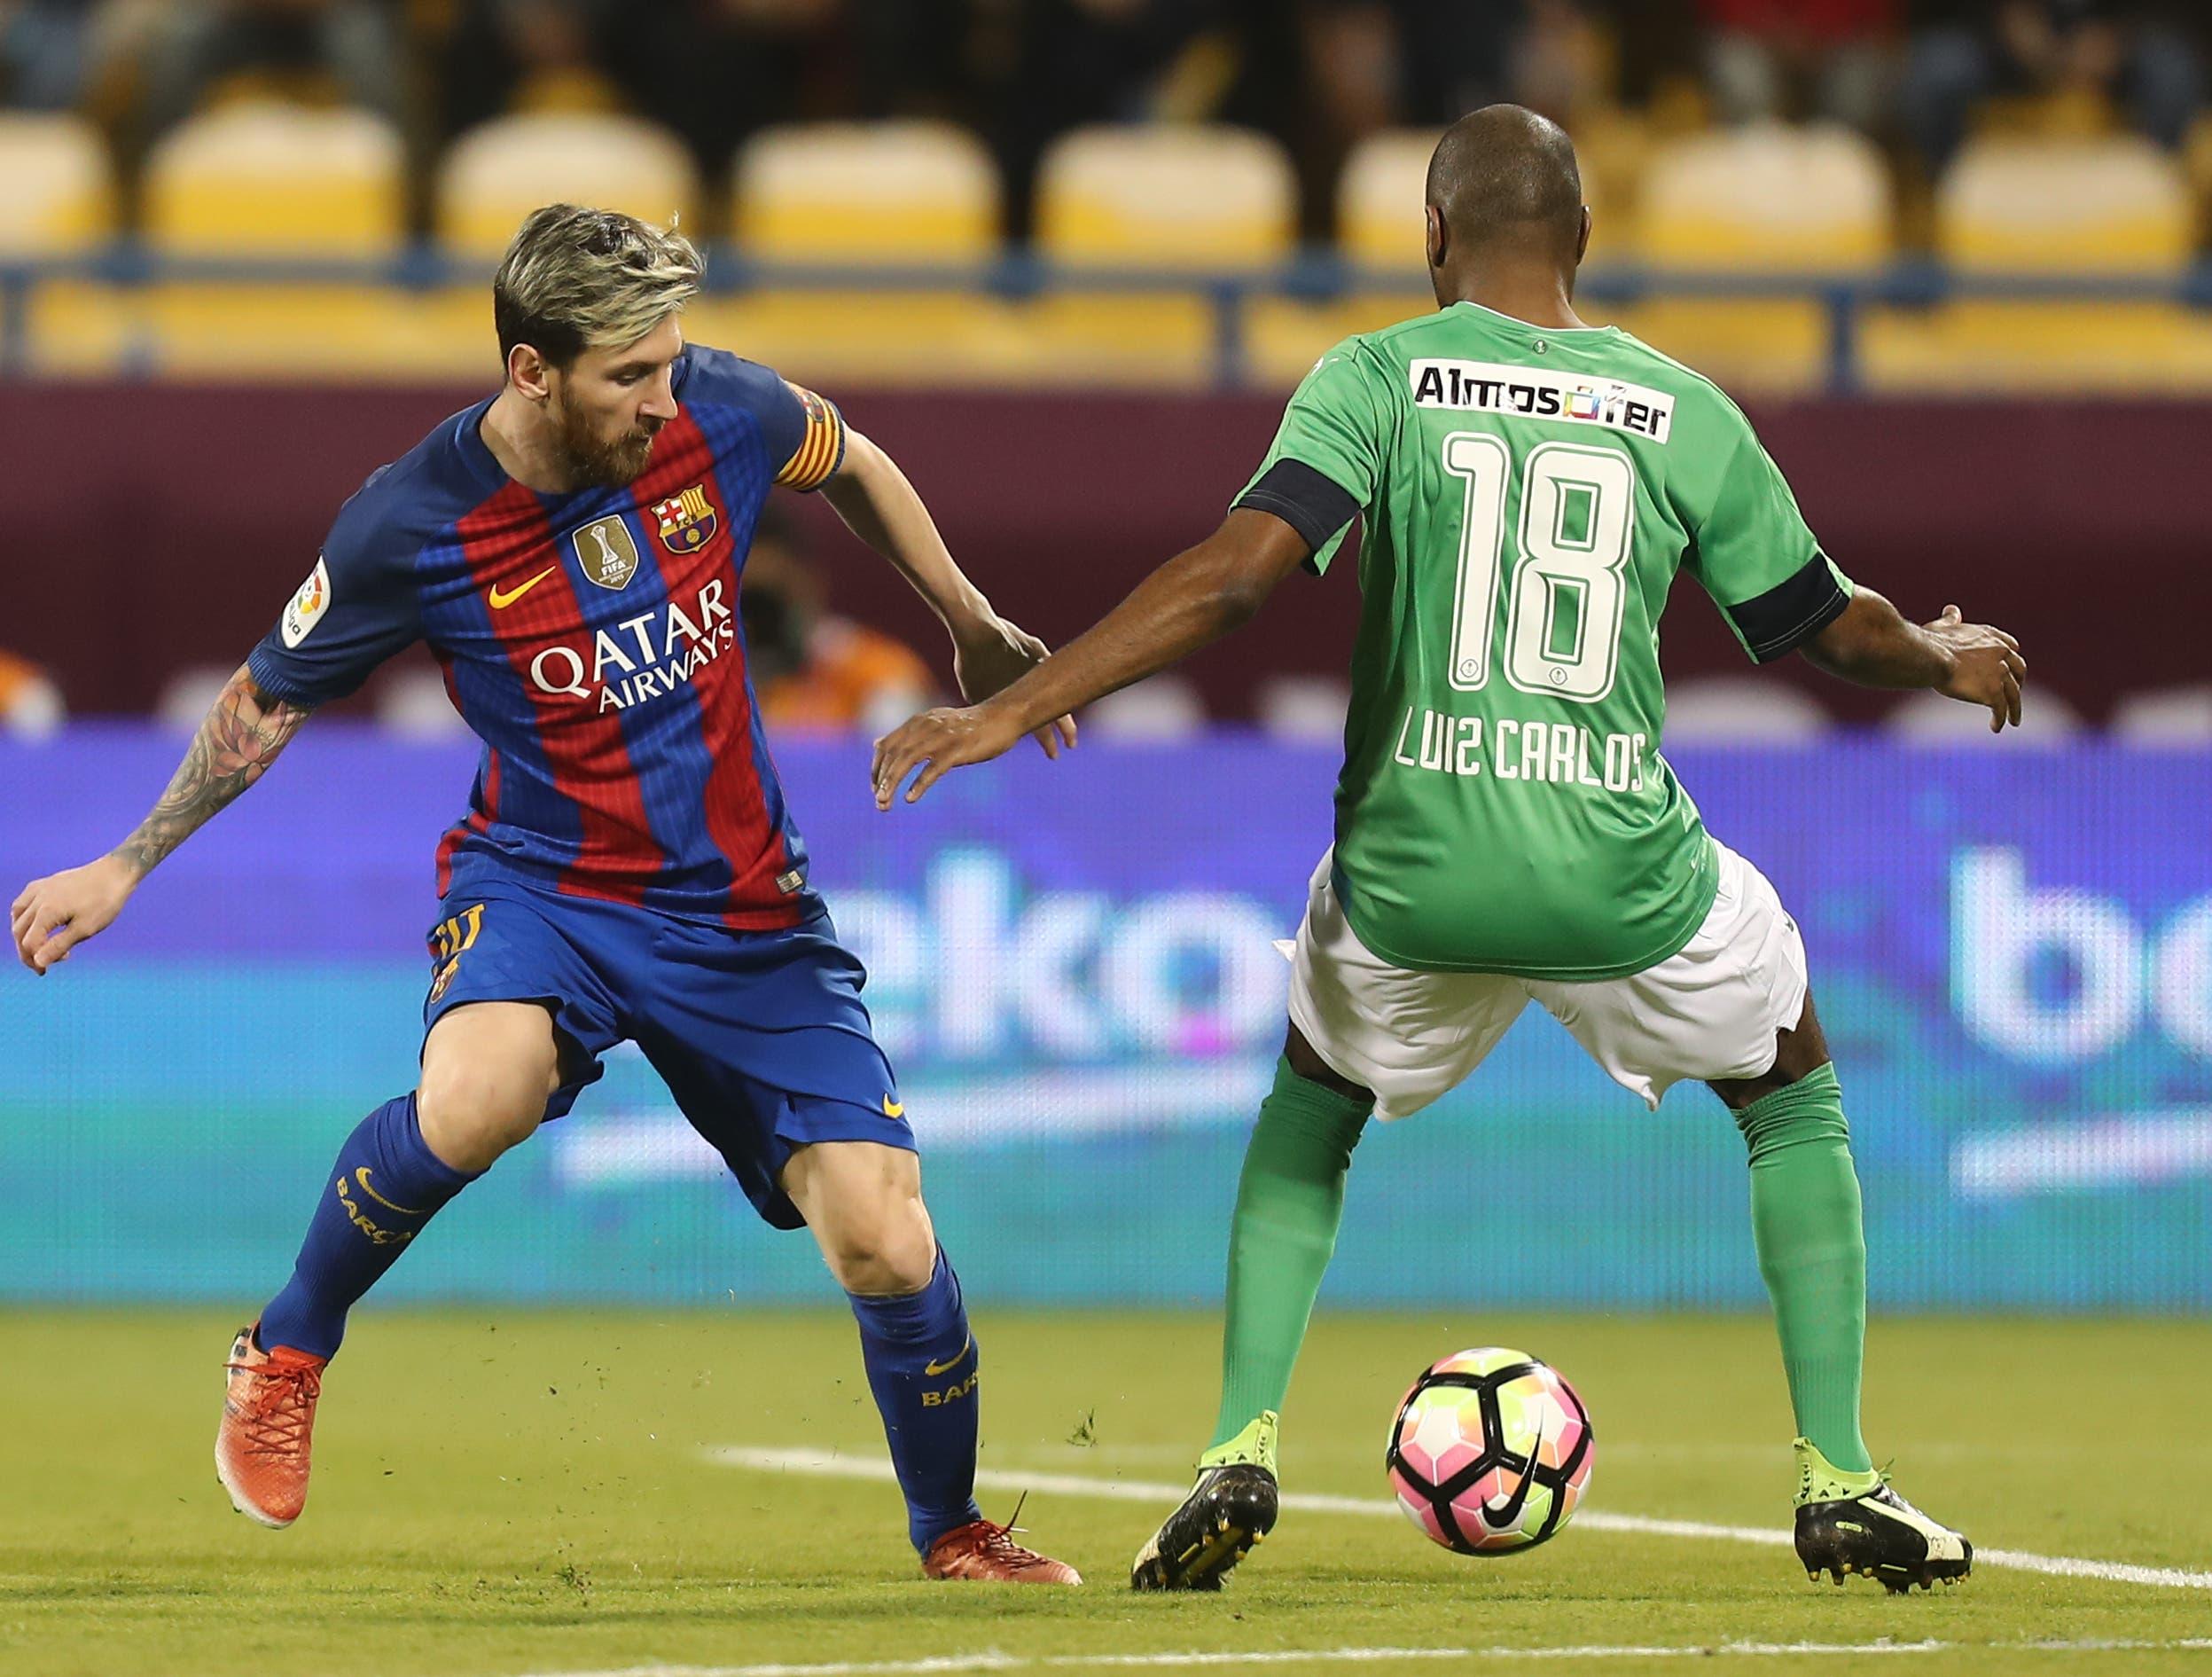 FC Barcelona's Lionel Messi (L) vies with Al-Ahli's Luiz Carlos during a friendly football match between FC Barcelona and Saudi Arabia's Al-Ahli FC on December 13, 2016 in the Qatari capital Doha. (AFP)